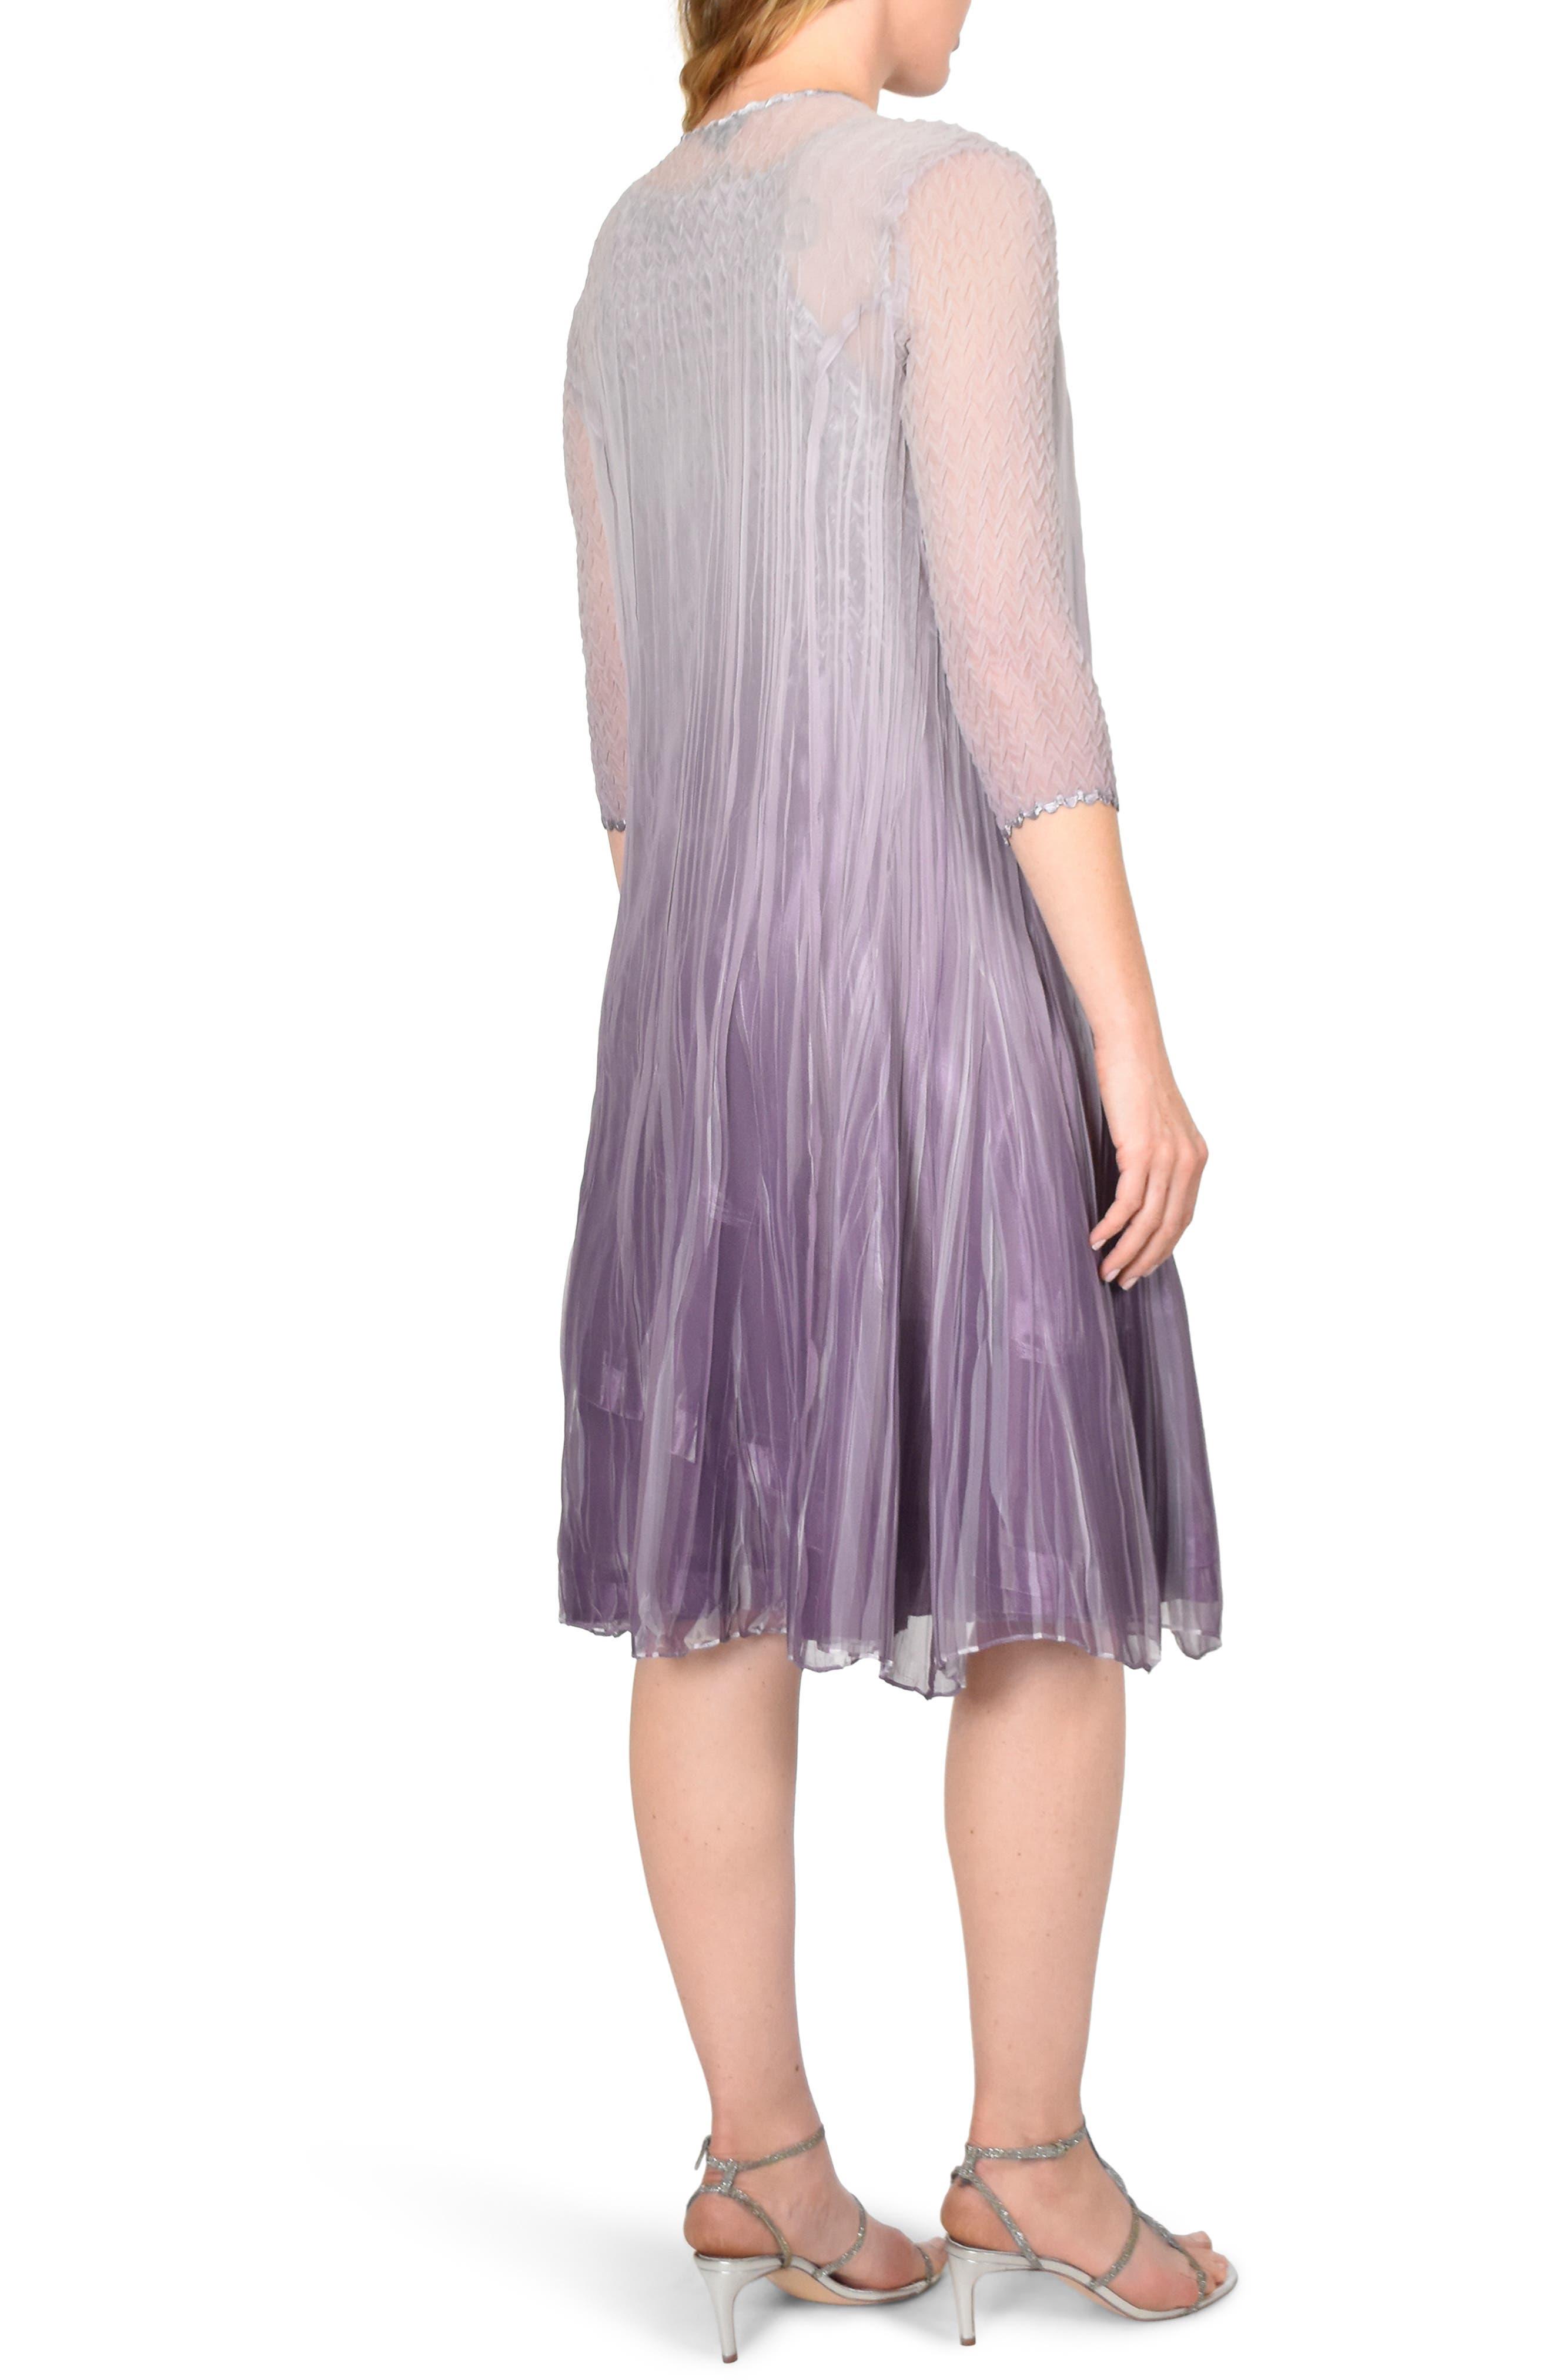 KOMAROV, Komorav Charmeuse Dress with Cascade Jacket, Alternate thumbnail 2, color, GREY VIOLET ORCHID OMBRE